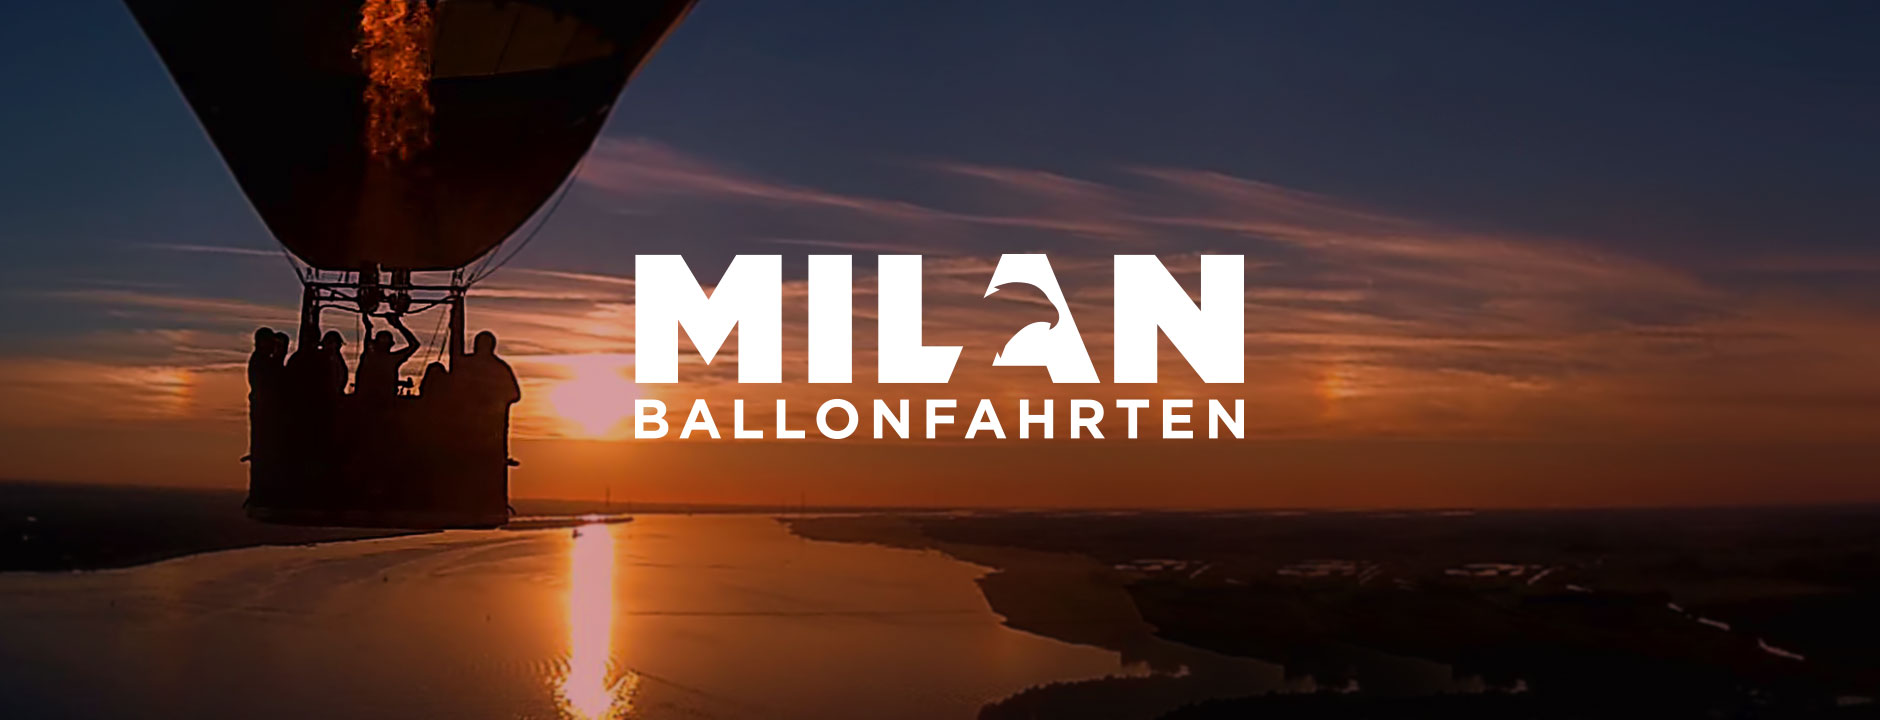 Milan Ballonfahrten - Design